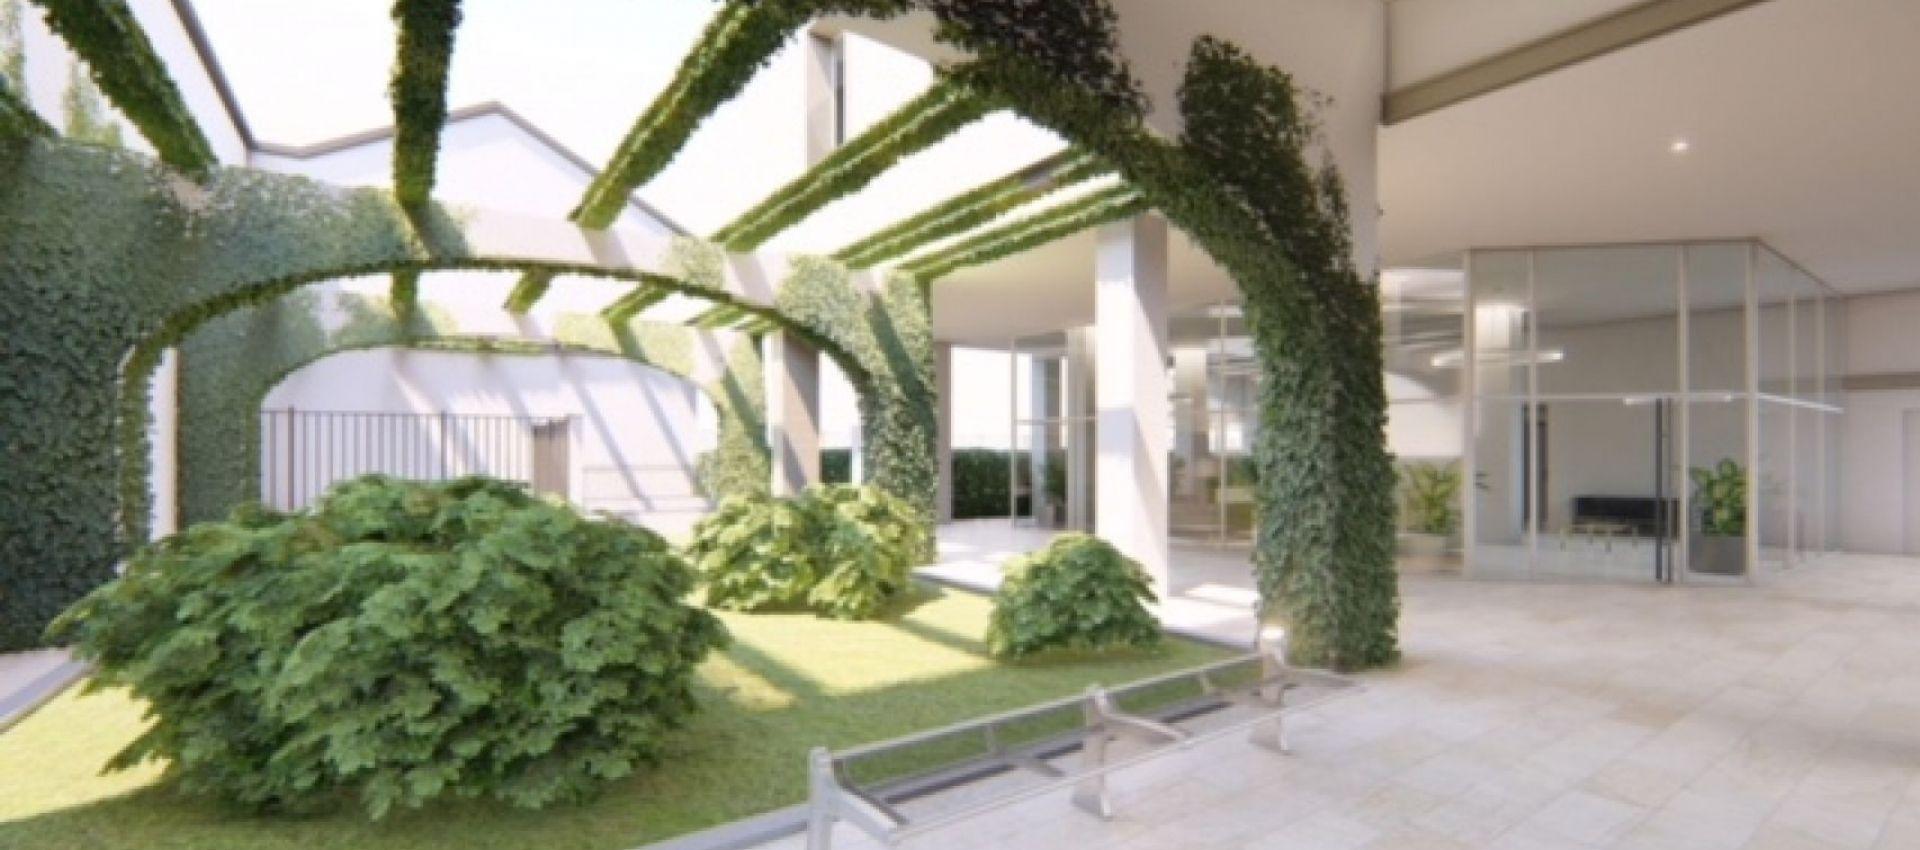 giardini di correzzana rendering